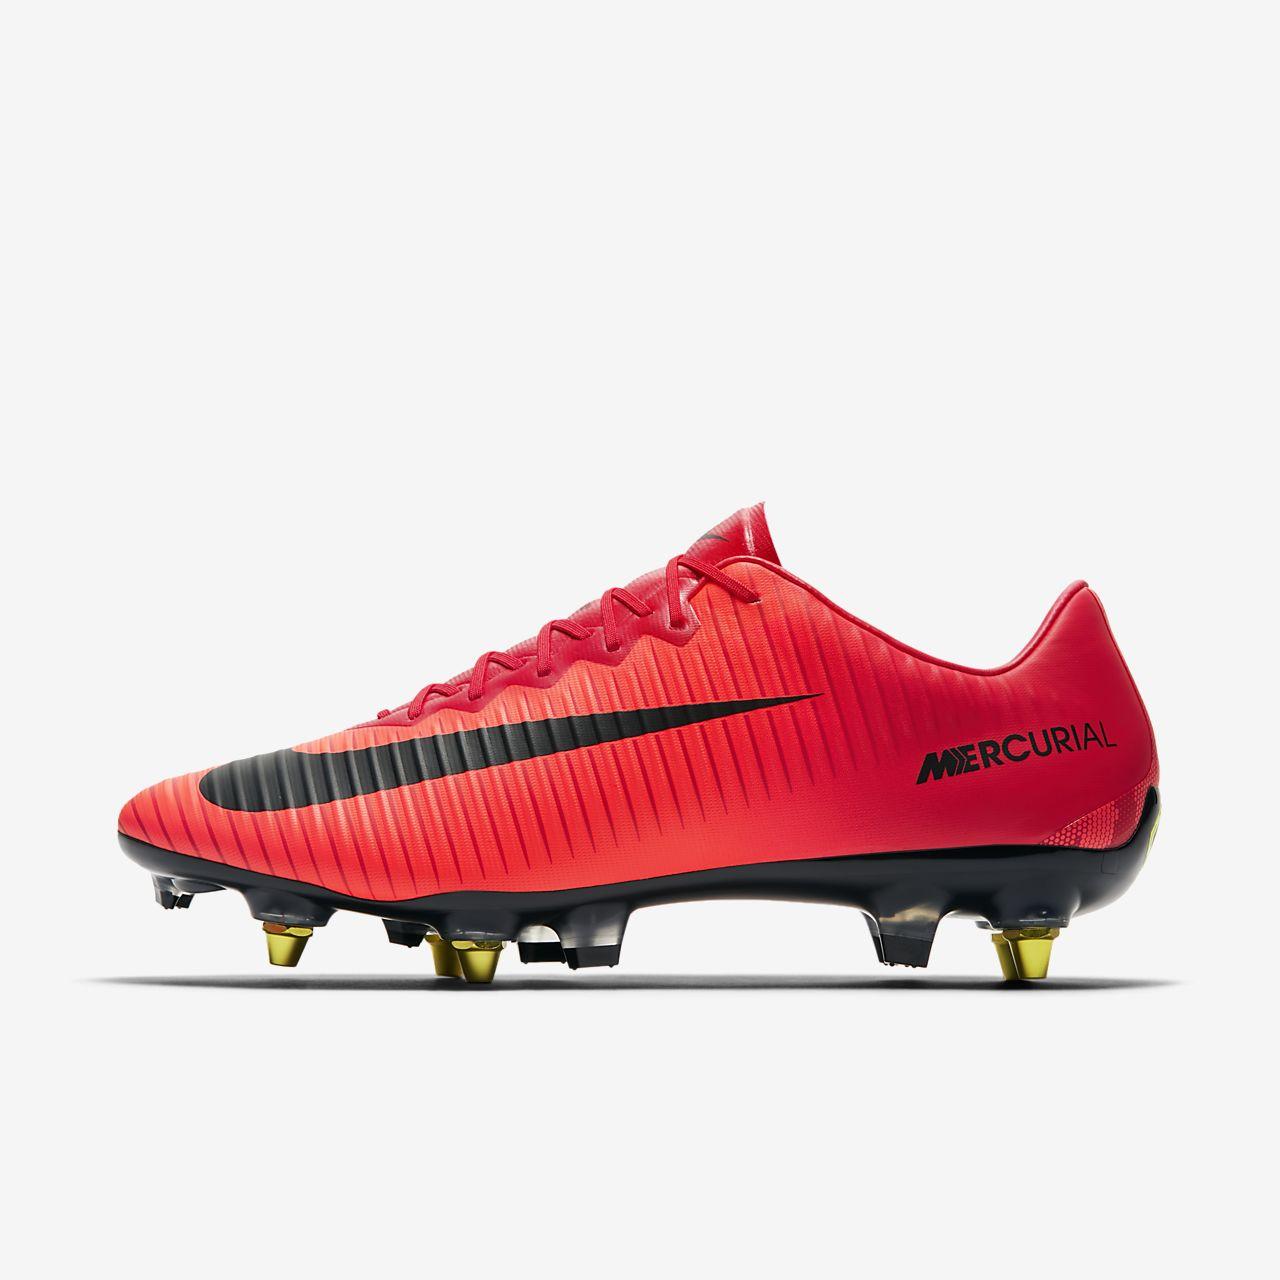 d97e5d47dddf9 Boot Nike Mercurial Nike Mercurial Superfly V Fg | NHS Gateshead